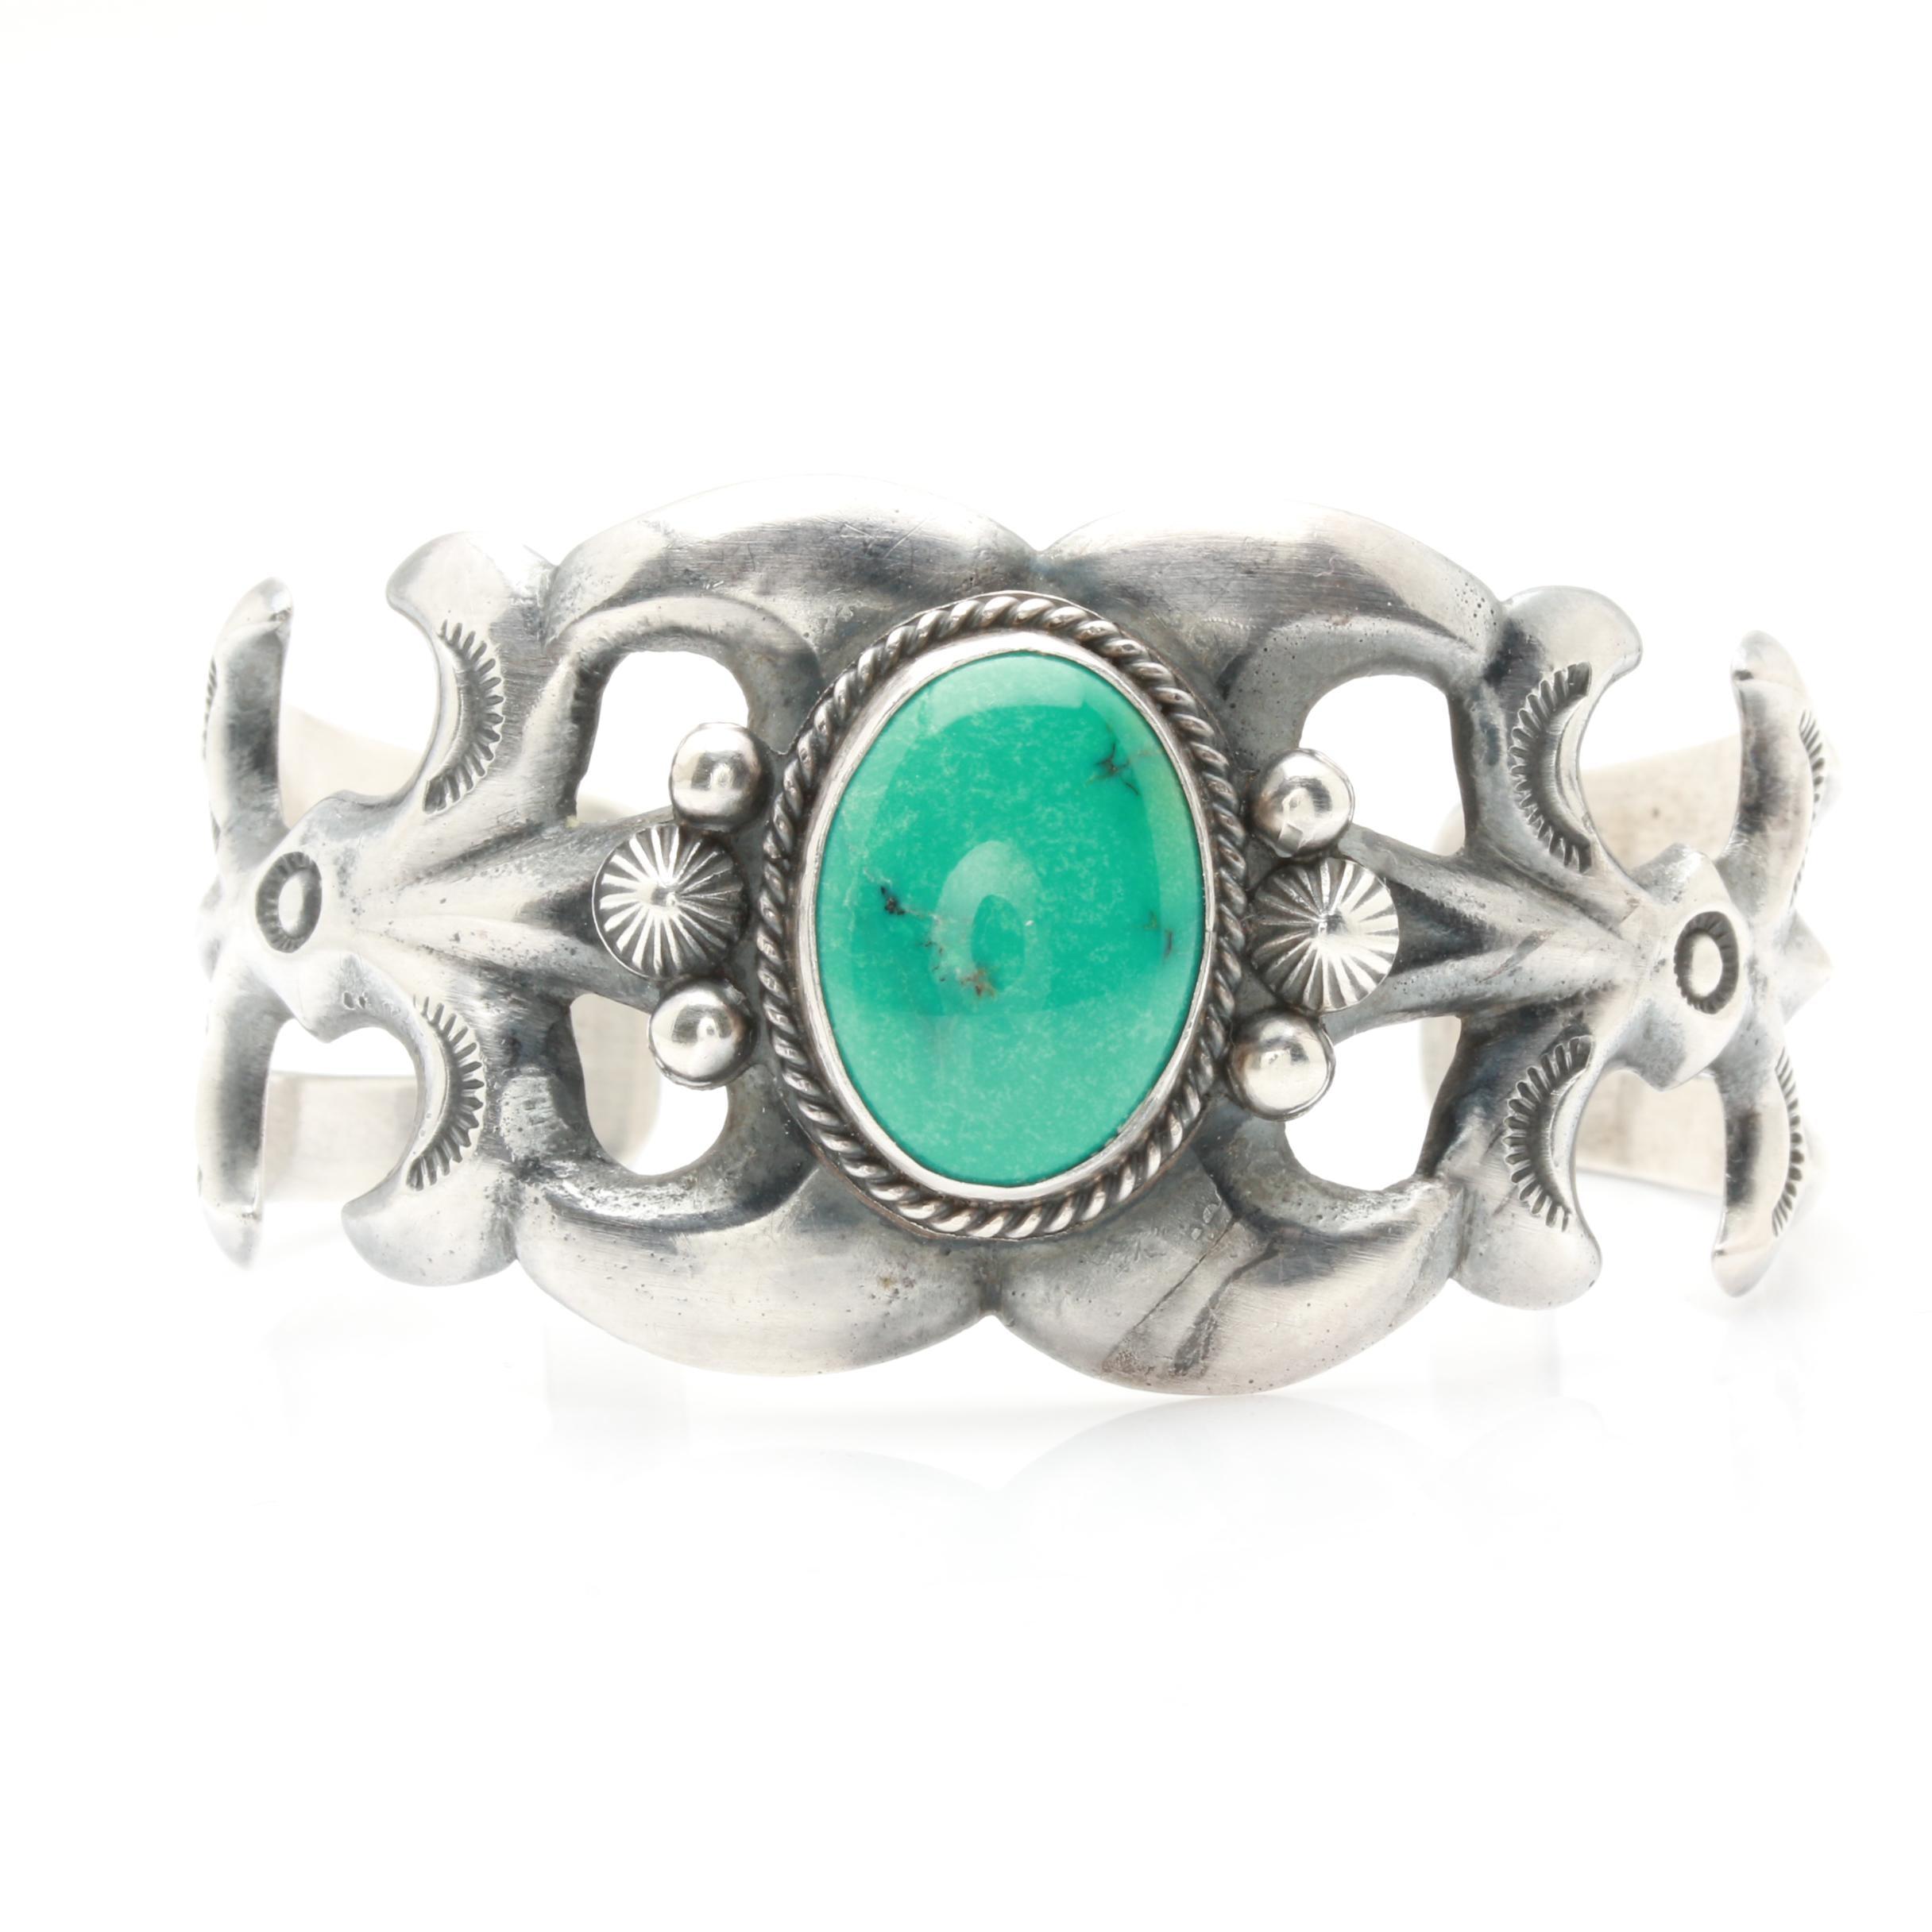 Harrison Bitsu Navajo Diné Sterling Silver Turquoise Cuff Bracelet